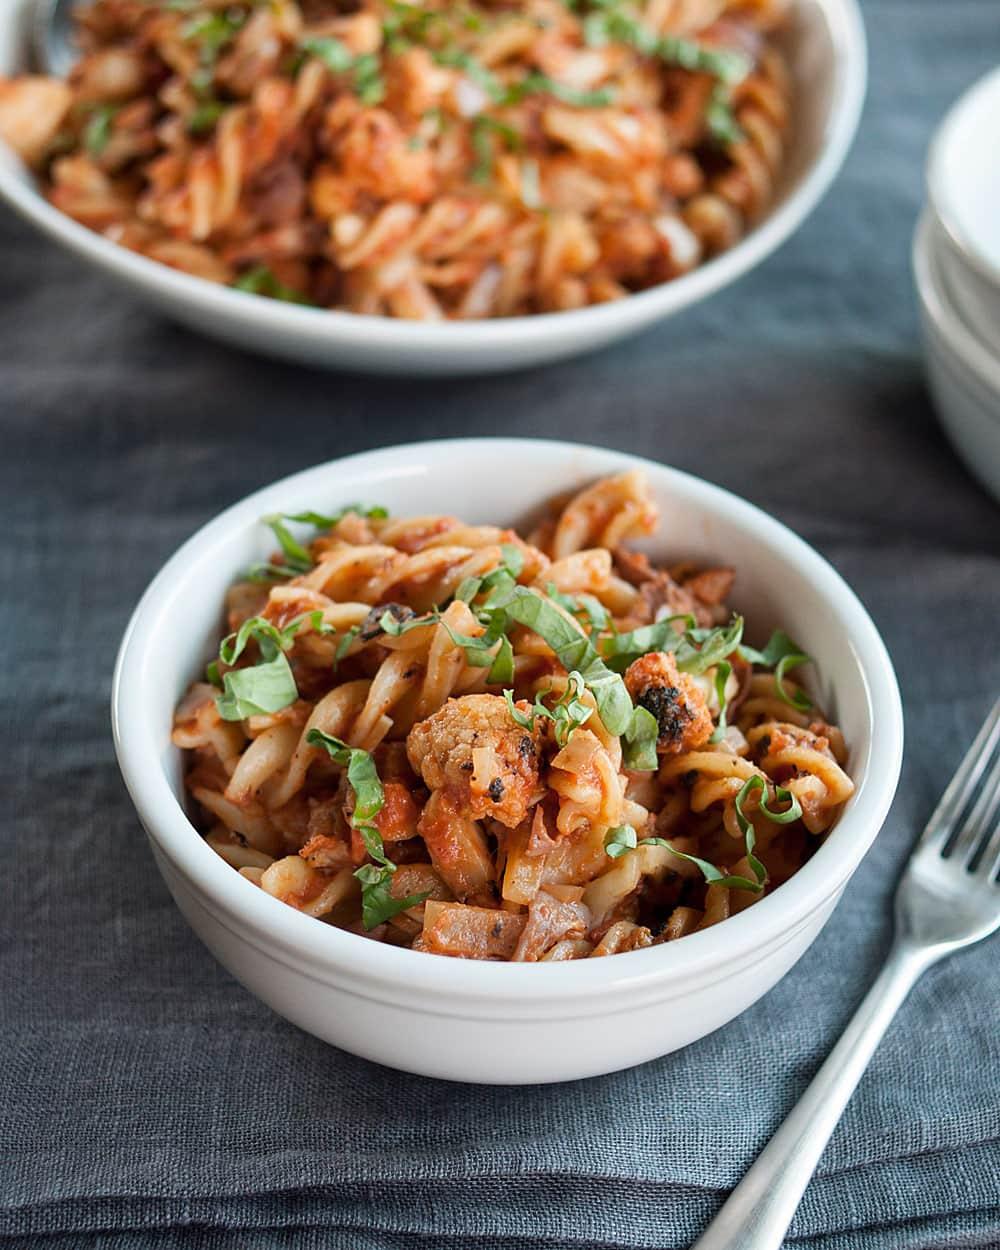 Recipe: Pan-Roasted Cauliflower & Pasta with Tomato-Cream Sauce